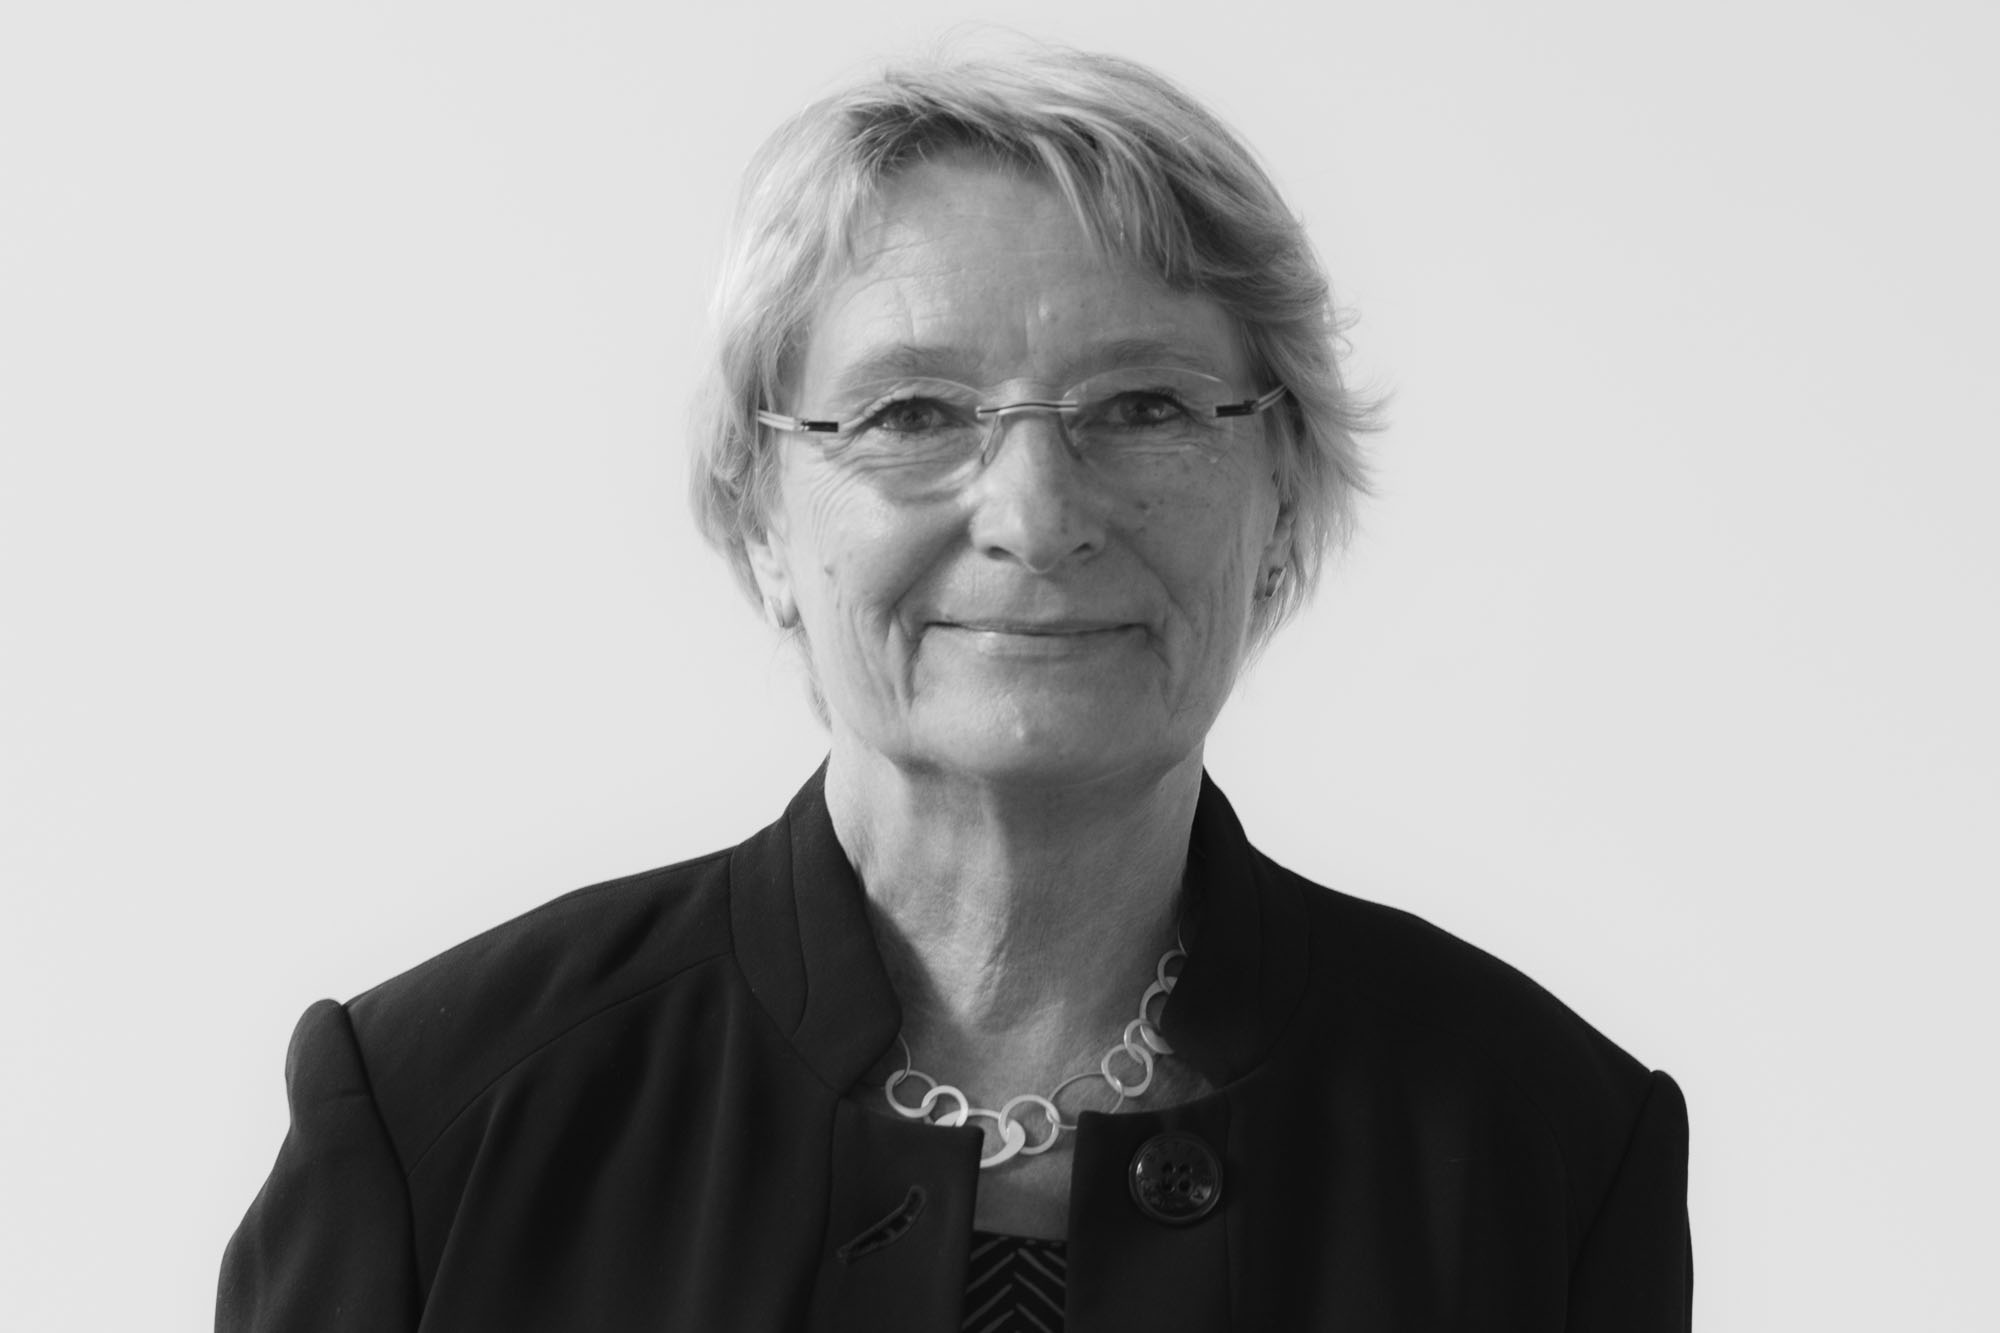 Sabine Feldmann / WIR Stadtplaner In NRW